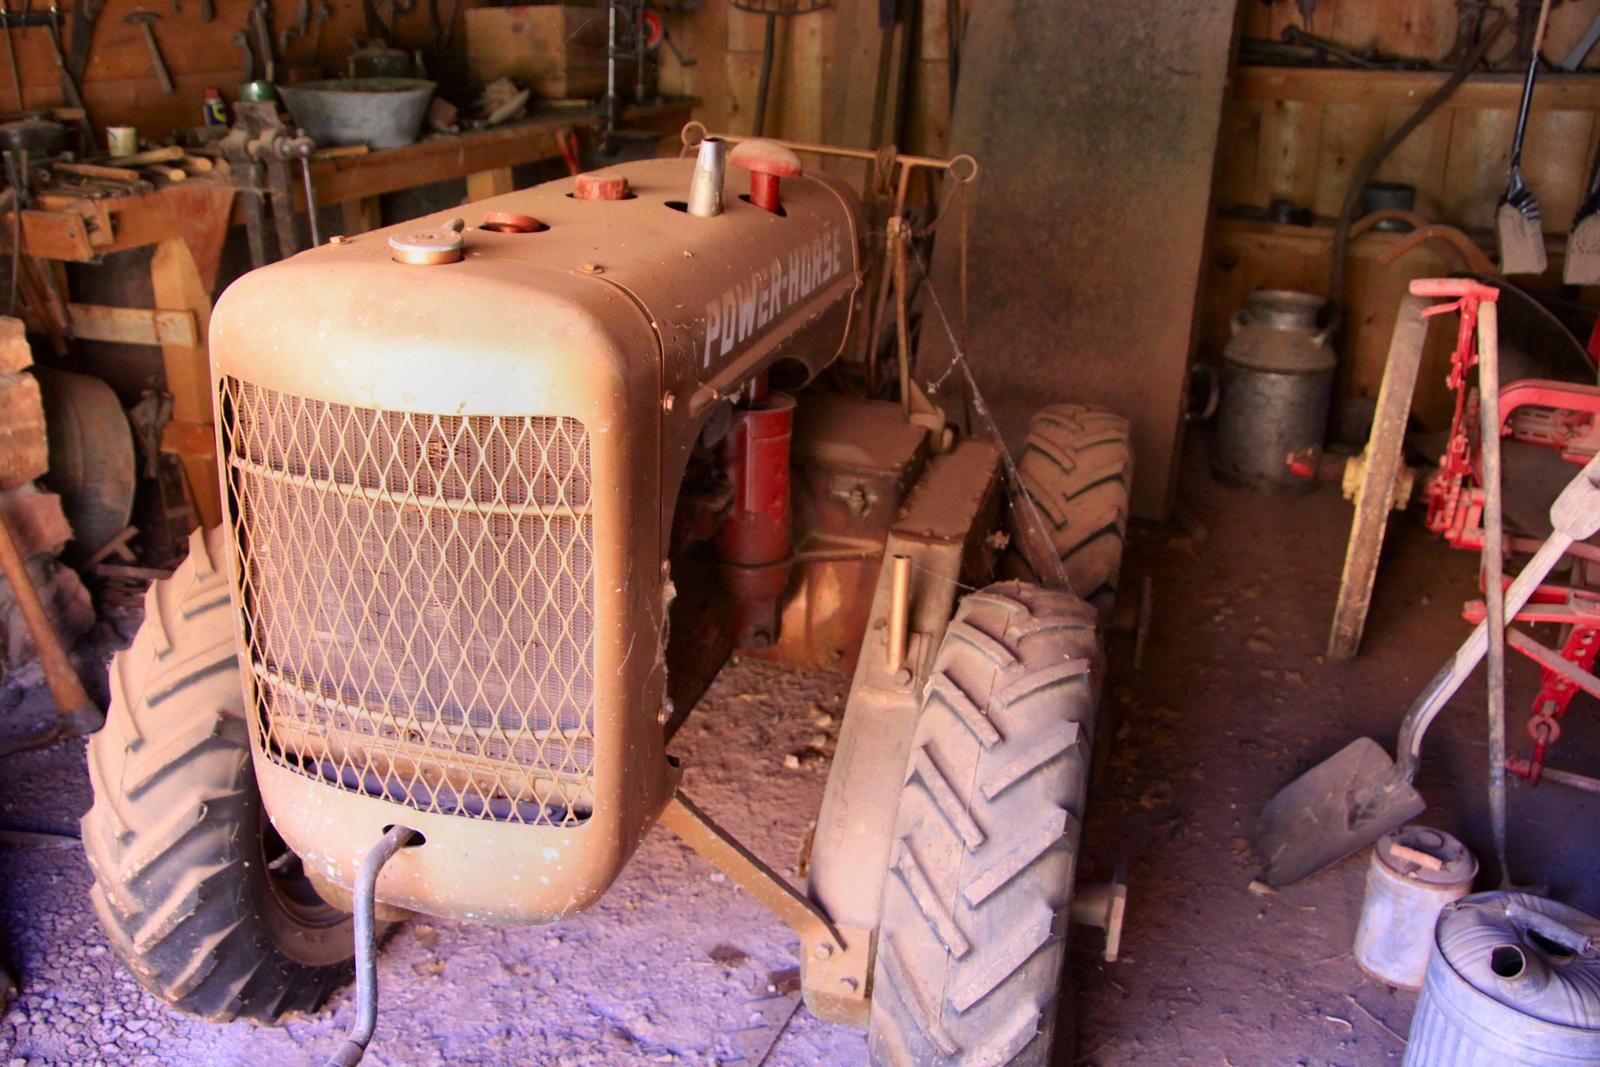 calox machinery Importgenius has the complete import/export history of calox veterinaria sa their july 21, 2011 shipment to calox dominicana baub bakerey machinery plaza expo.